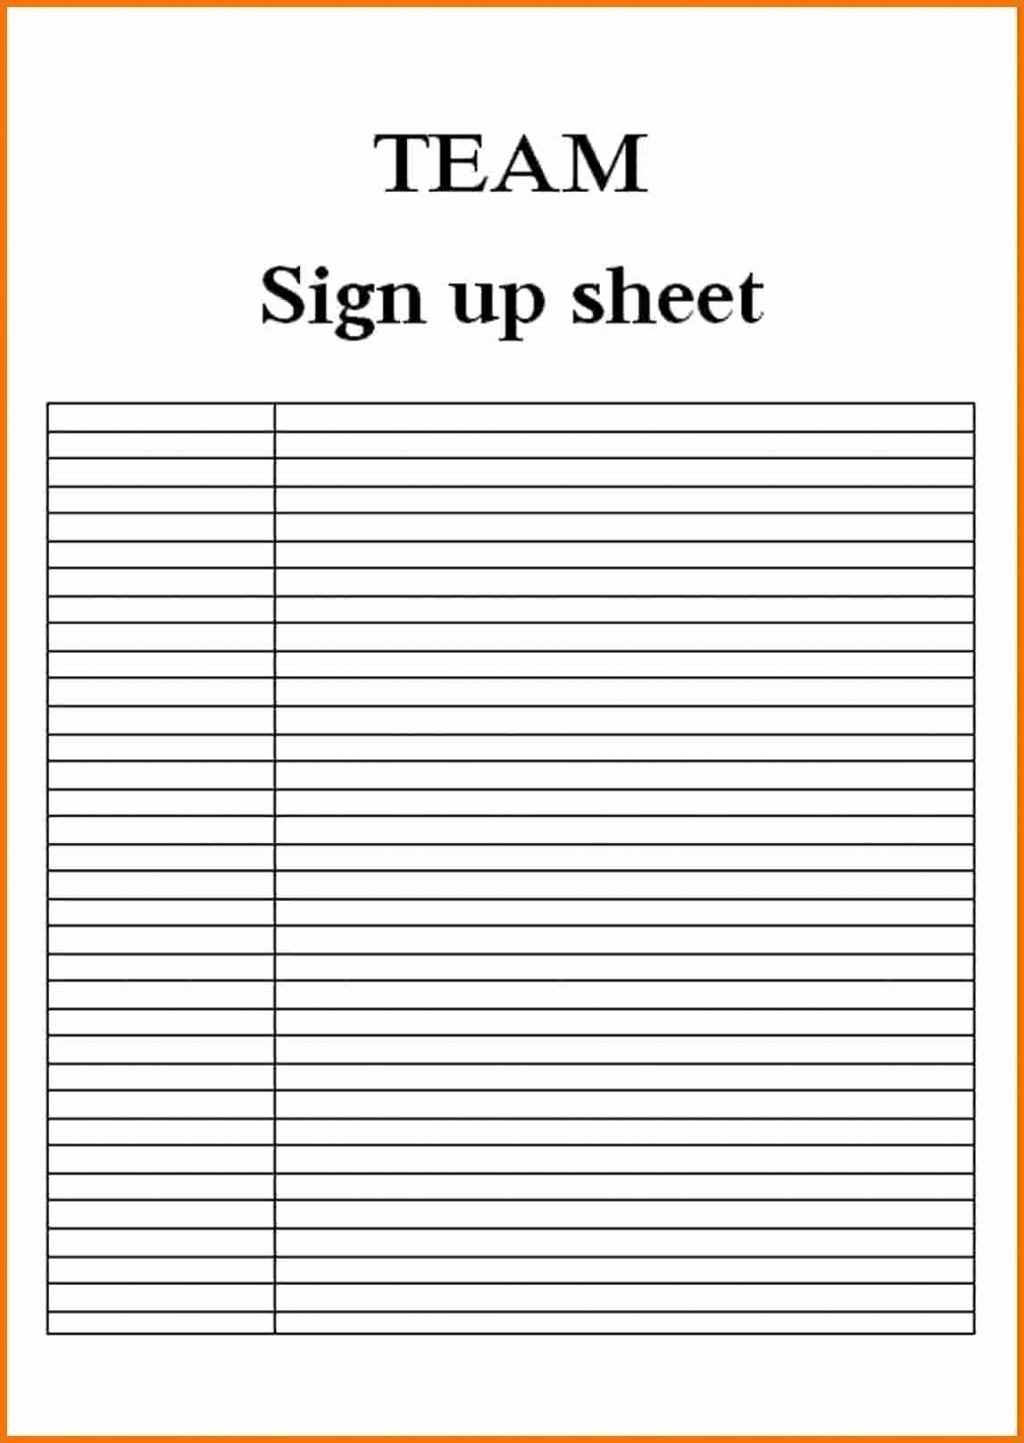 Blank Sign Up Sheet Template Elegant 9 Blank Sign Up Sheets attendance Sheet Download Central